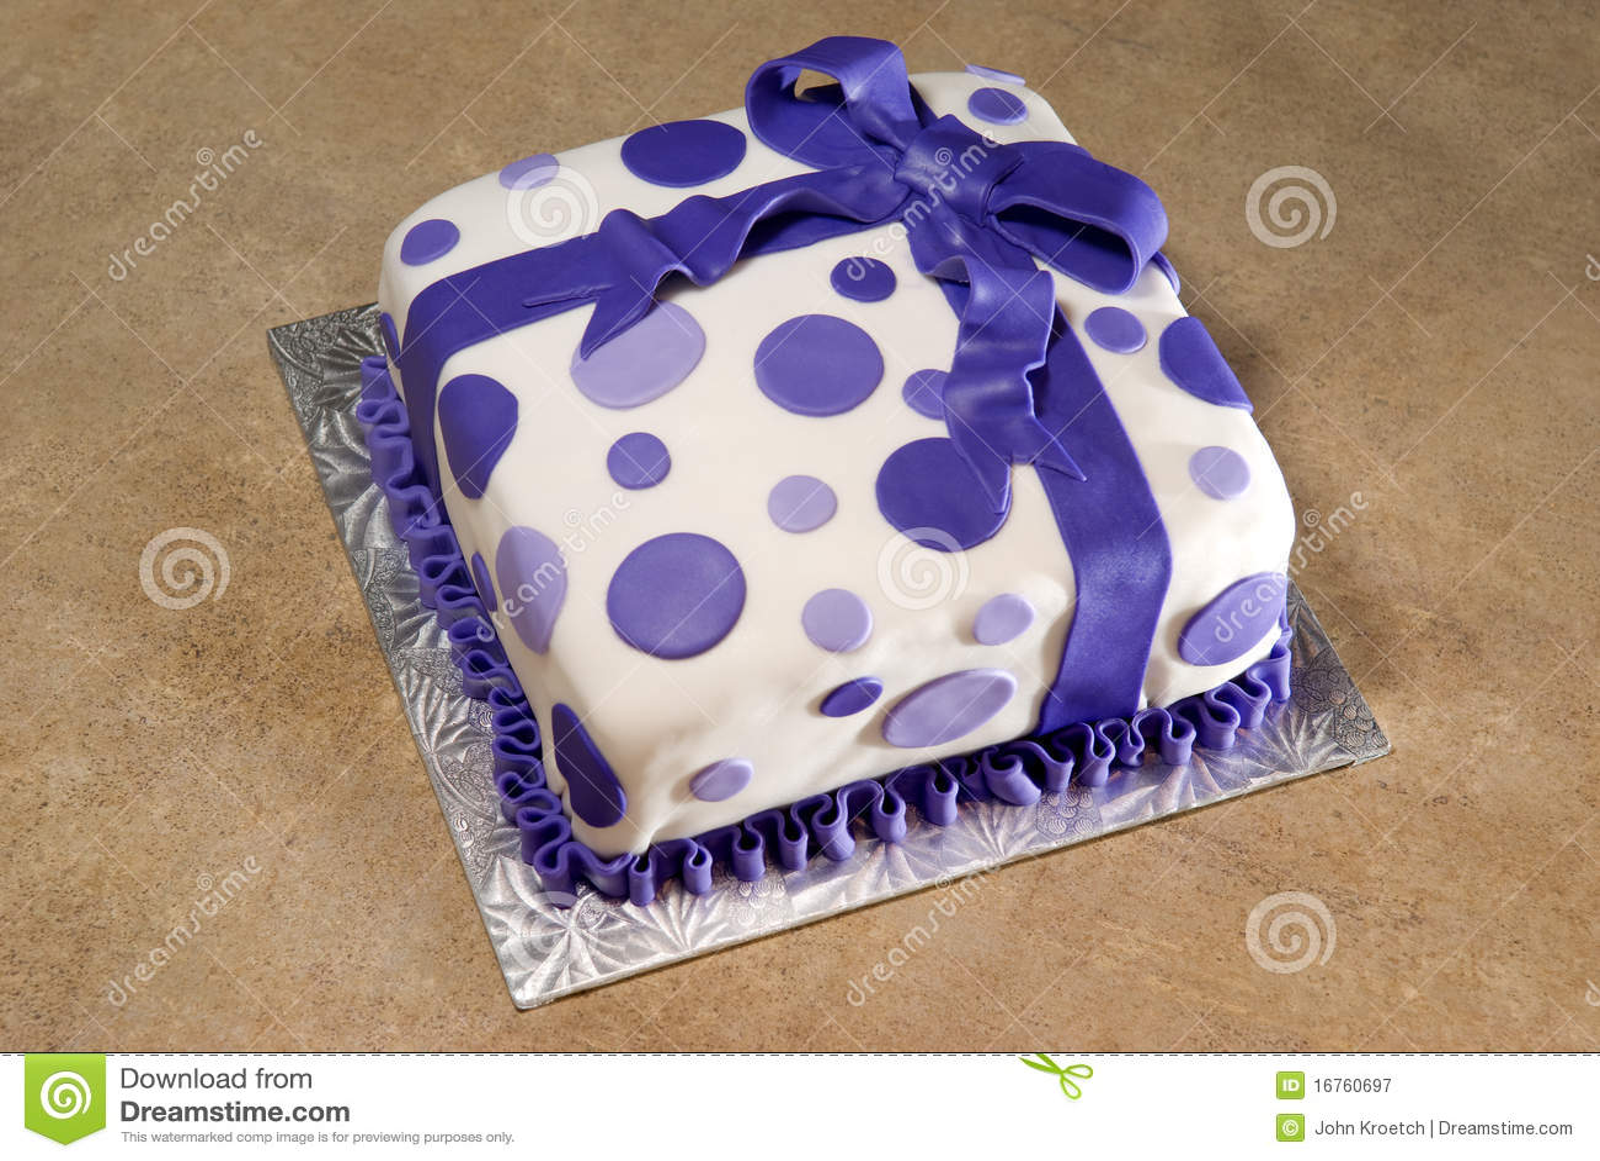 Amazing Fancy Decorated Birthday Cake Stock Image Image Of Ribbon Funny Birthday Cards Online Alyptdamsfinfo